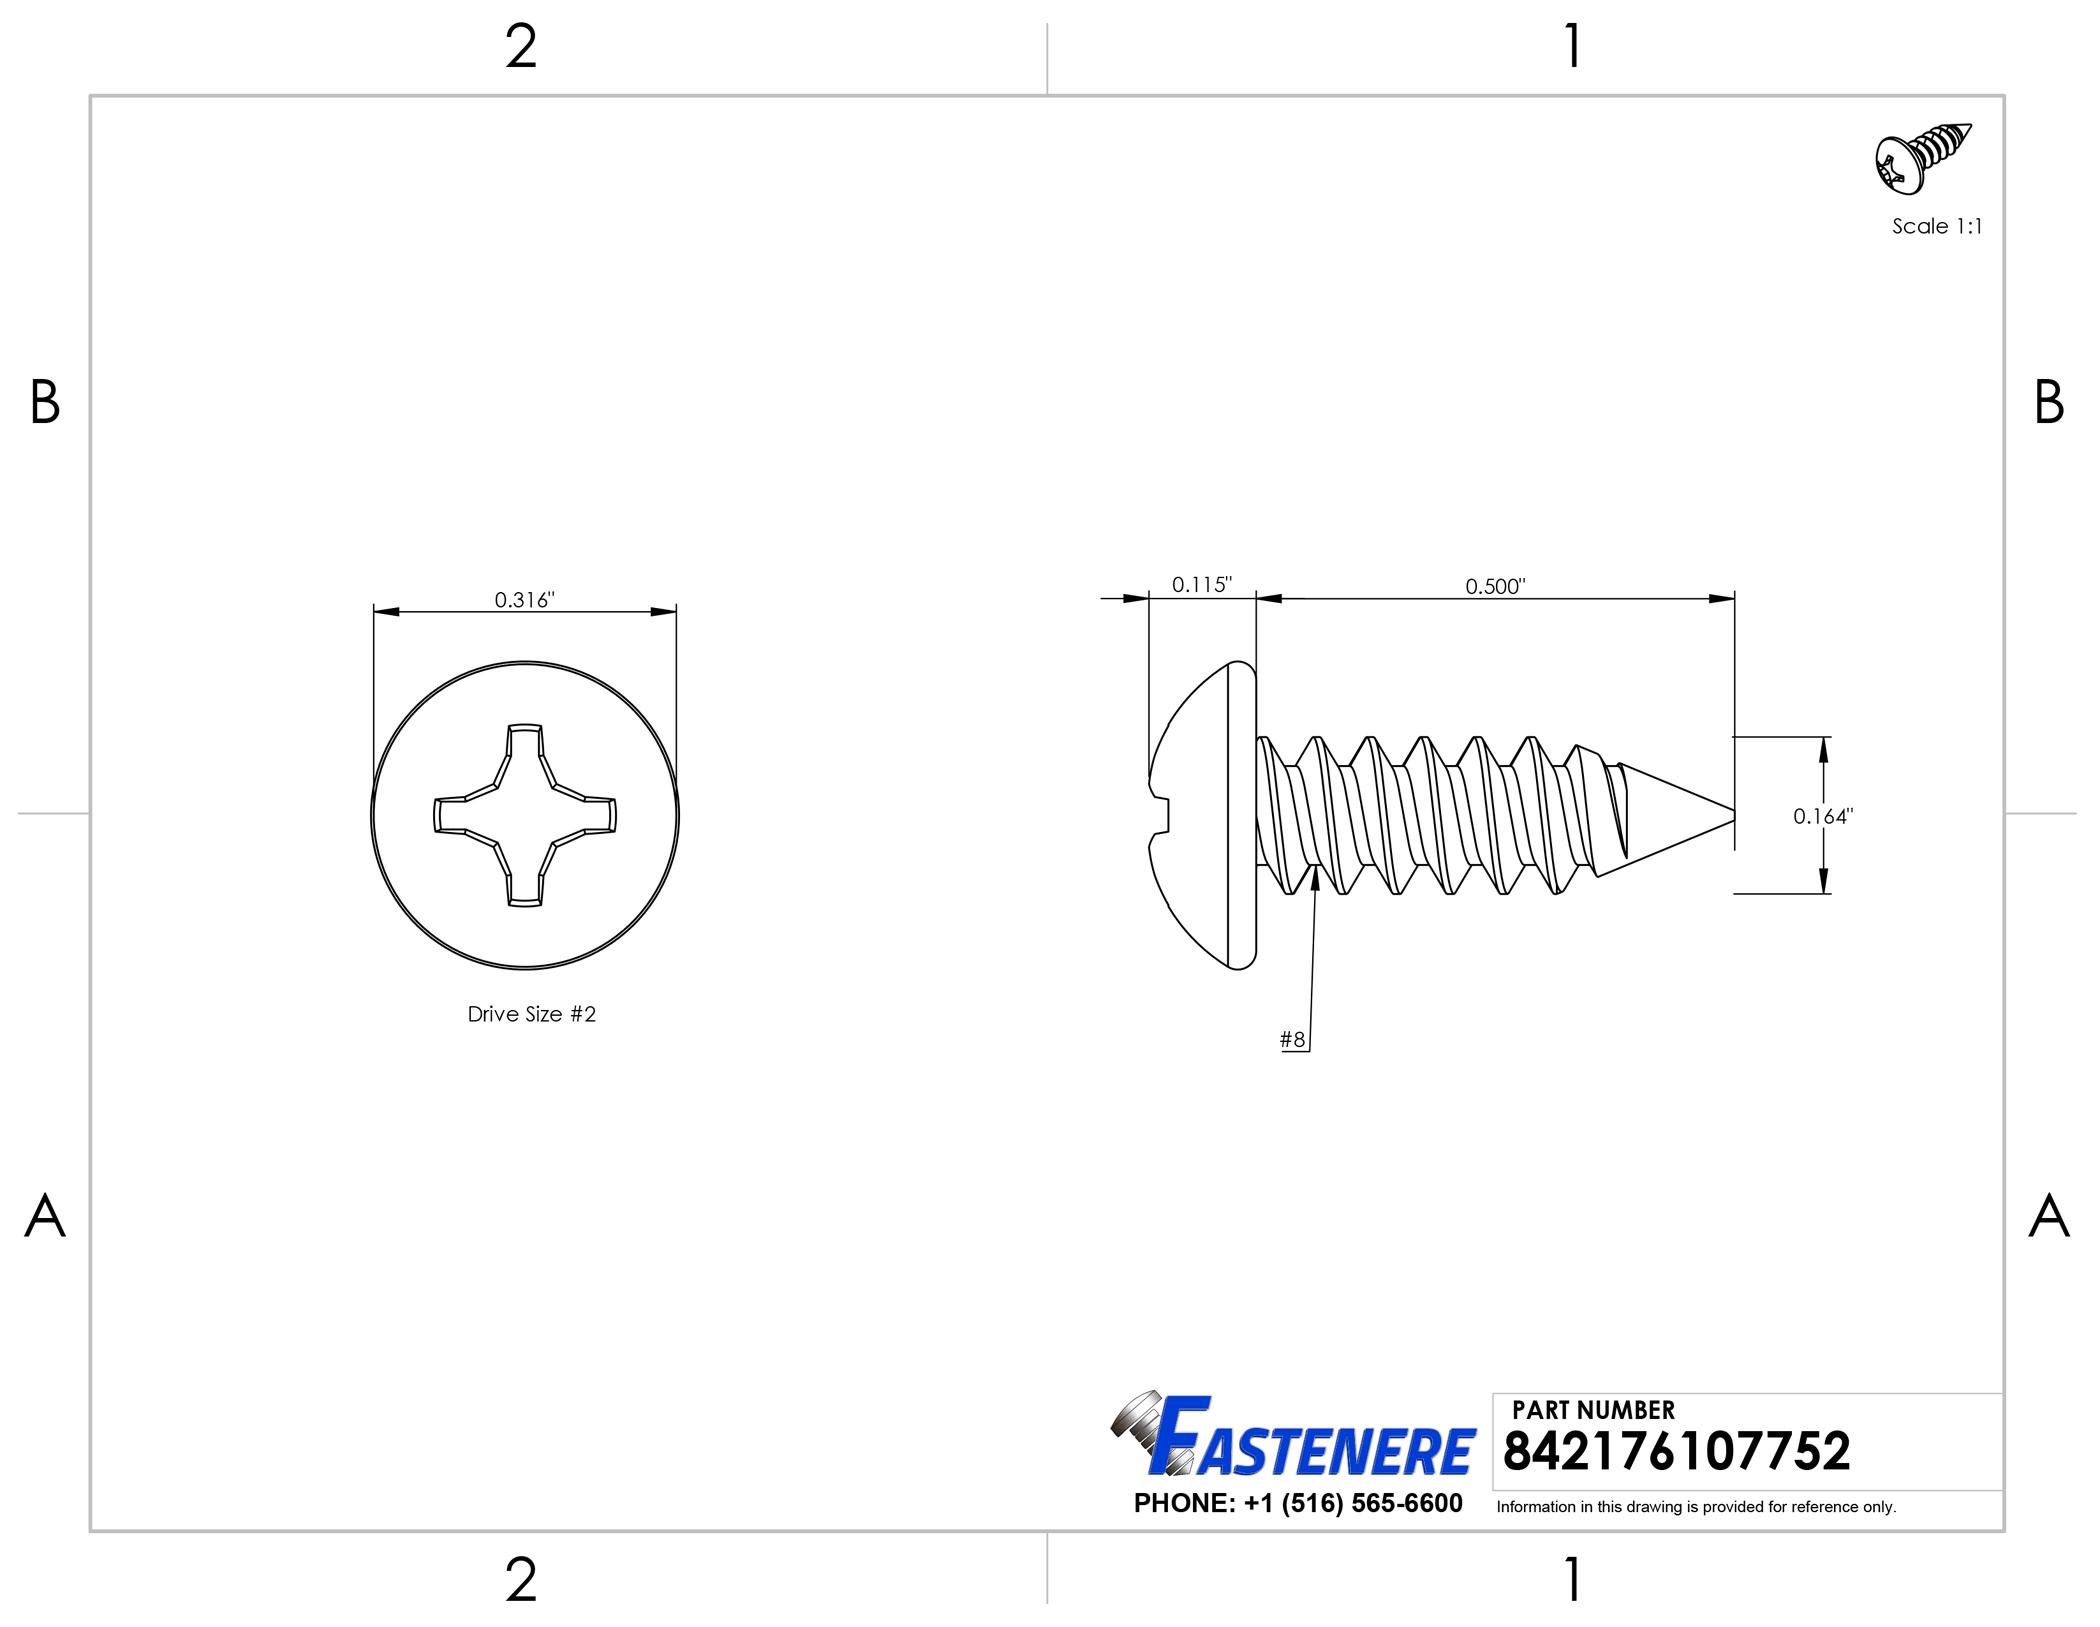 Pan Head Sheet metal Screws 316 Stainless Steel Marine Grade #8X1//2 Qty 100